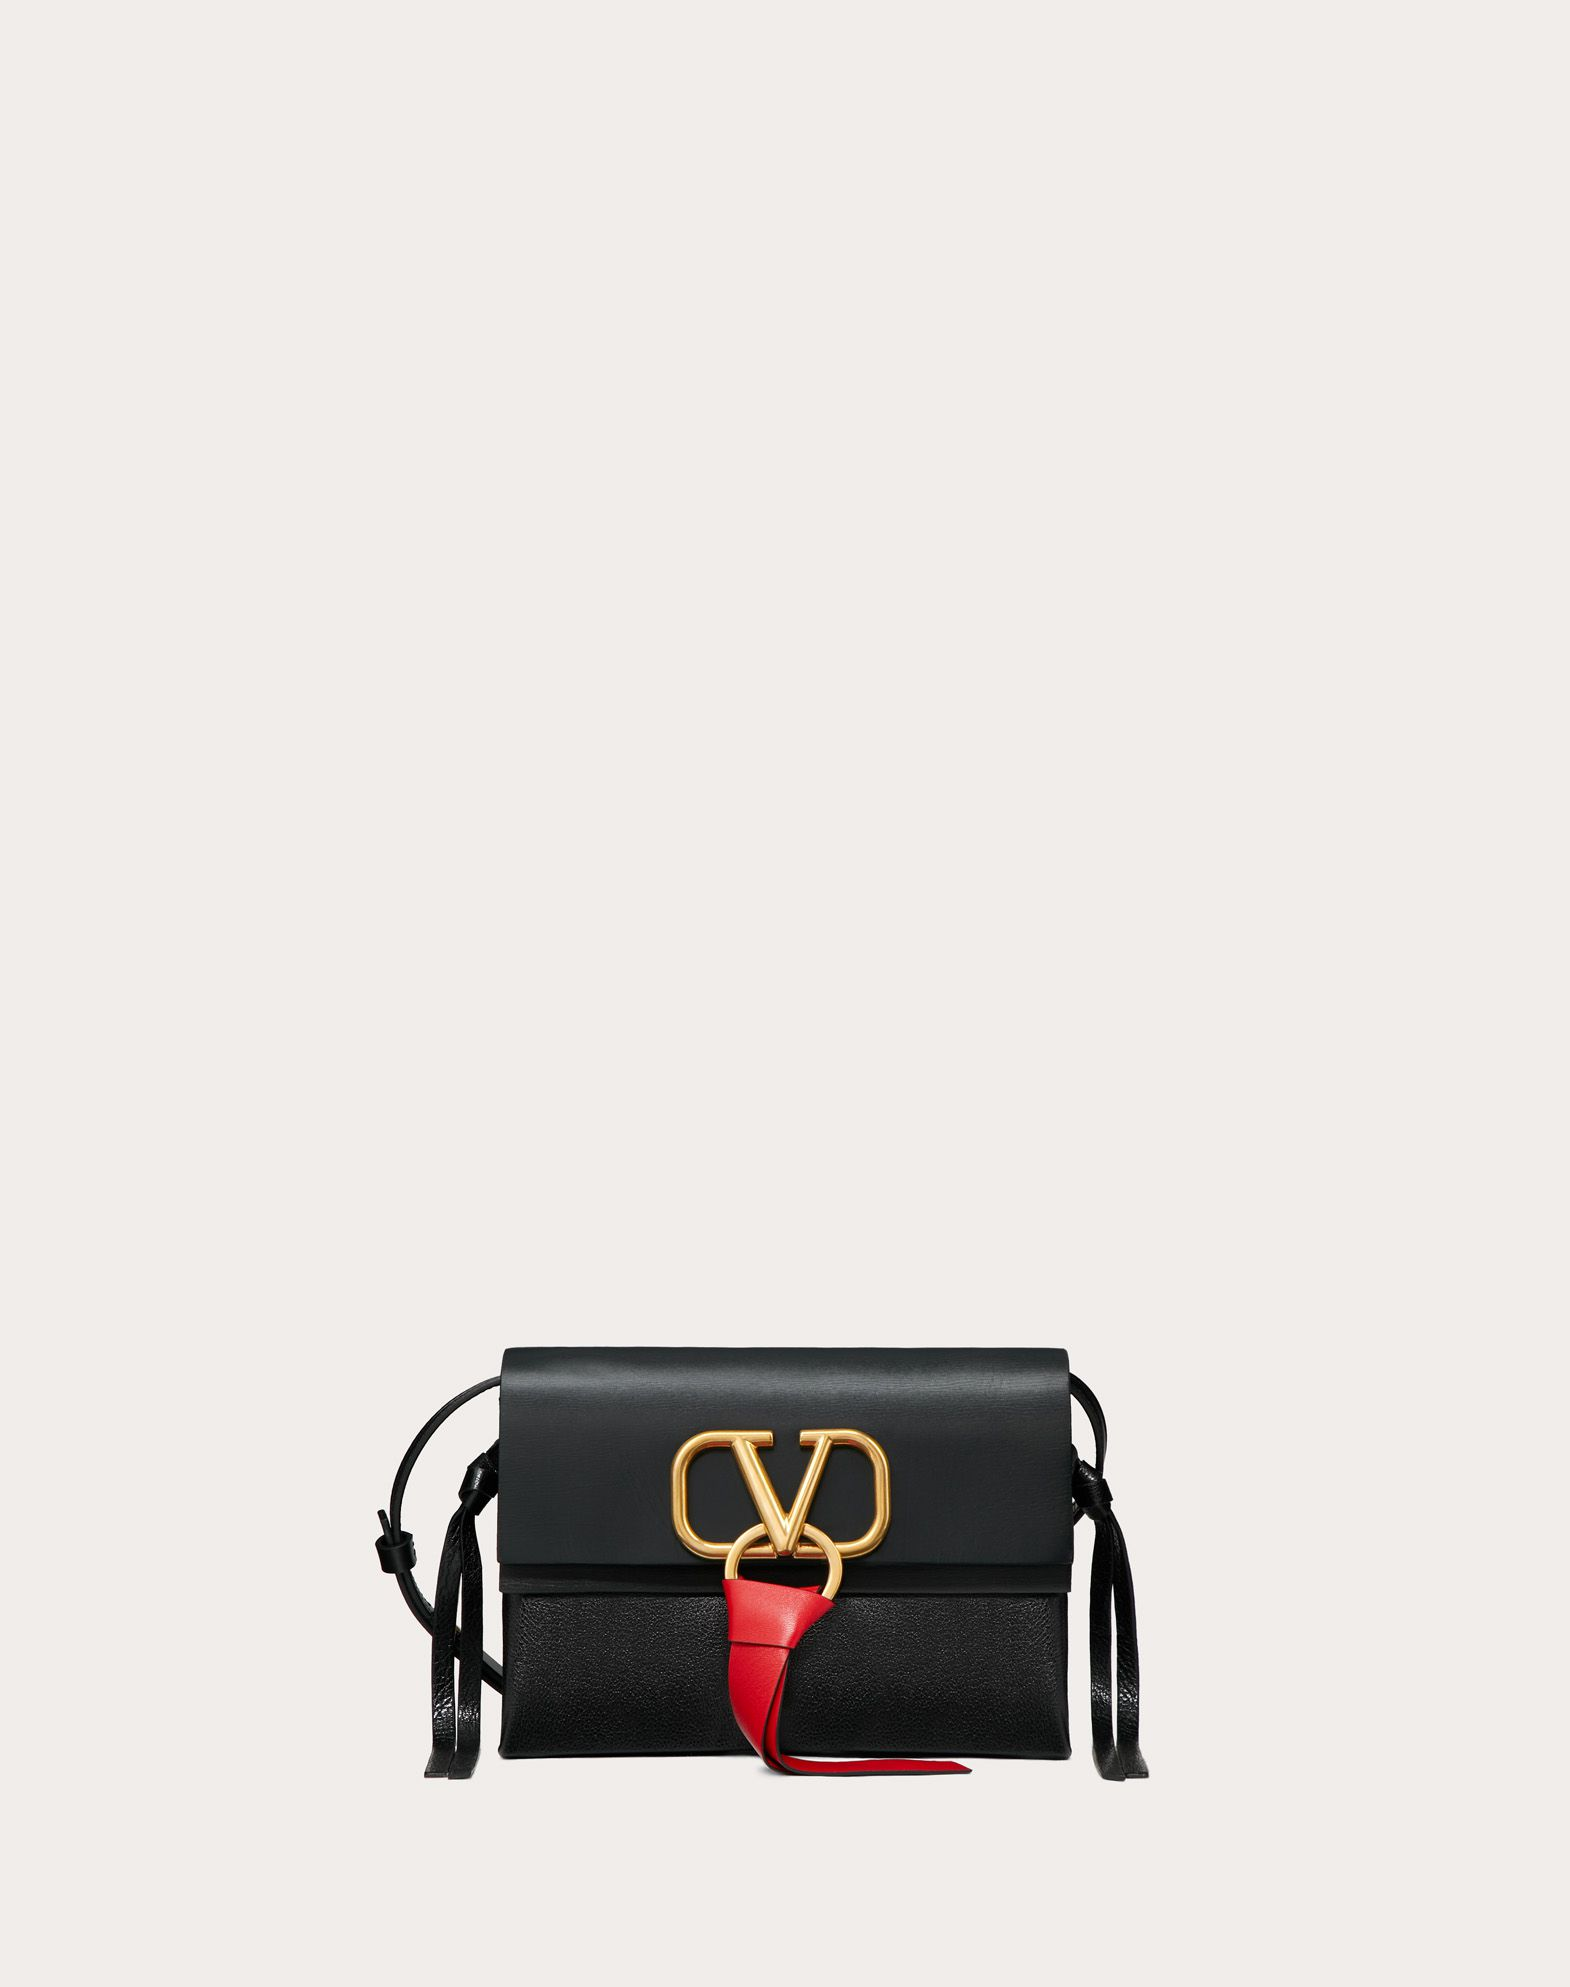 Small VRing Smooth Calfskin Crossbody Bag